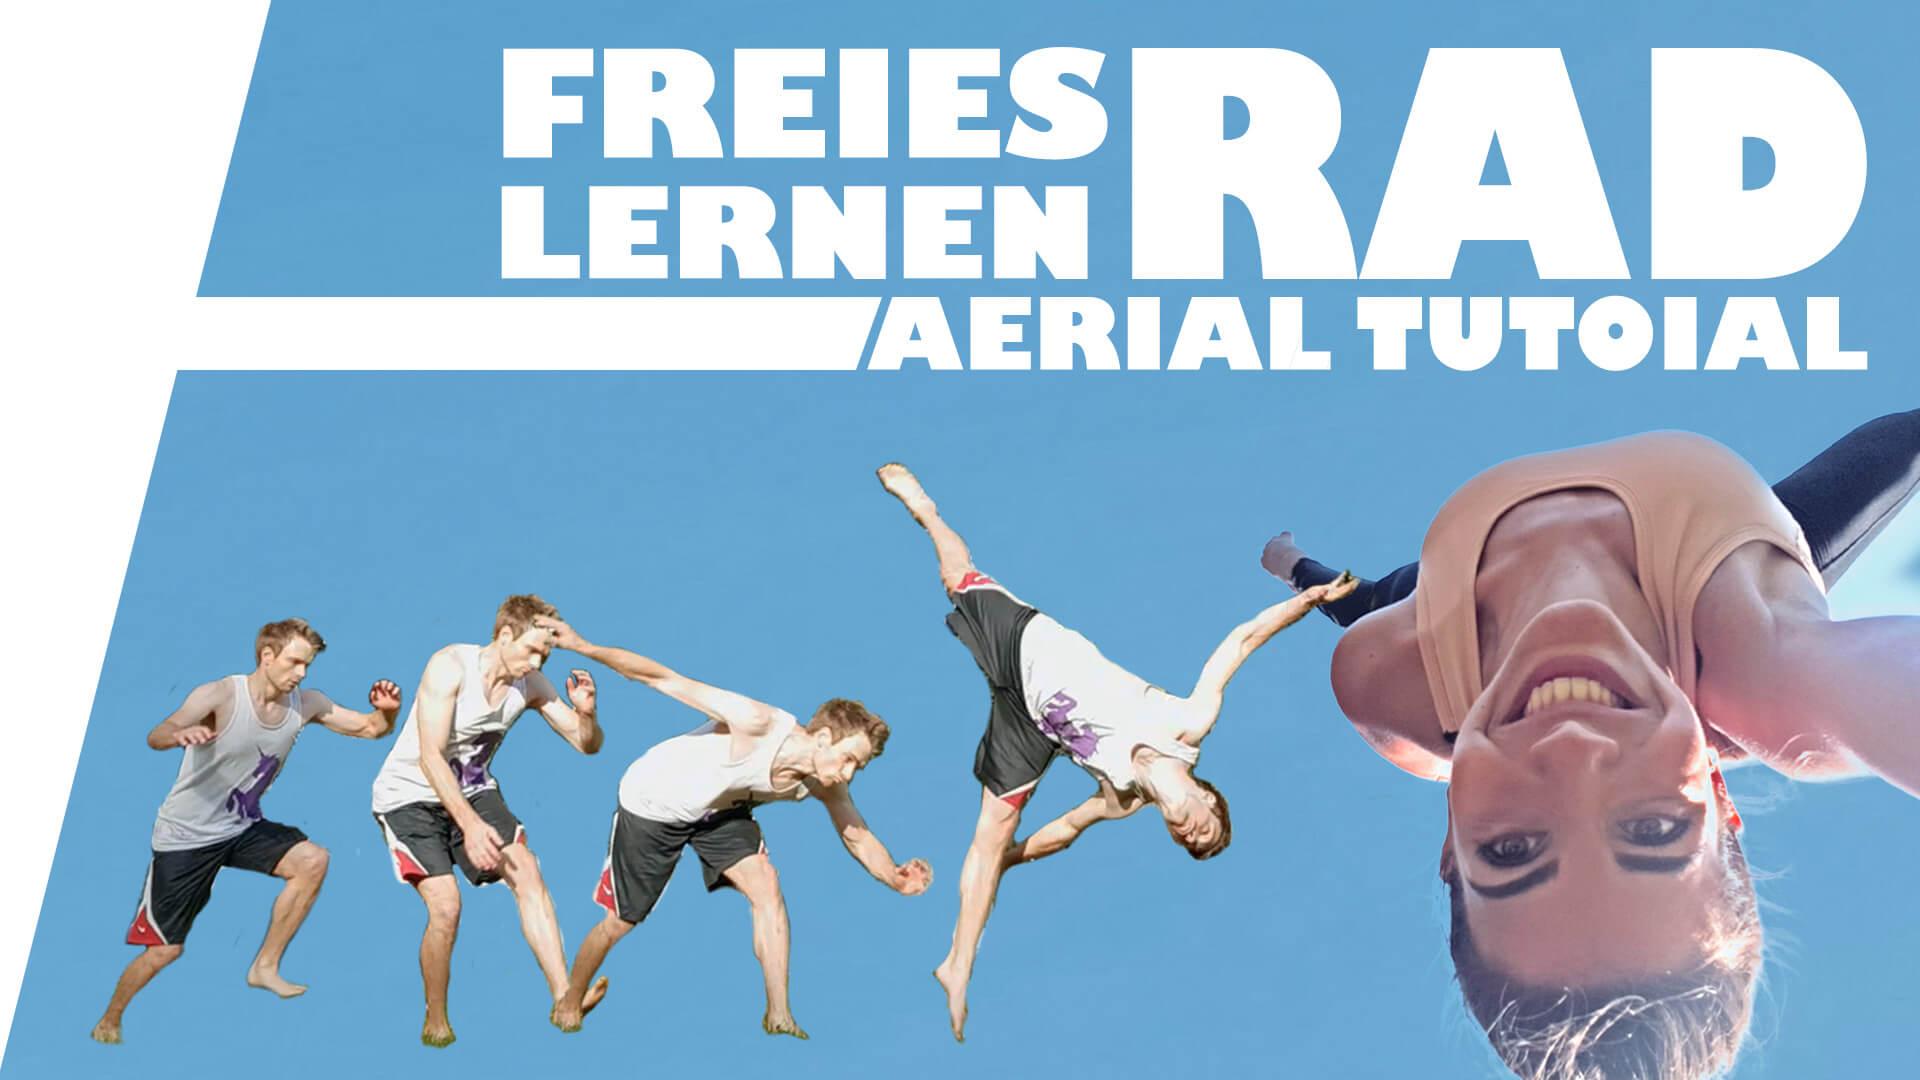 freies rad lernen aerial tutorial thumbnail